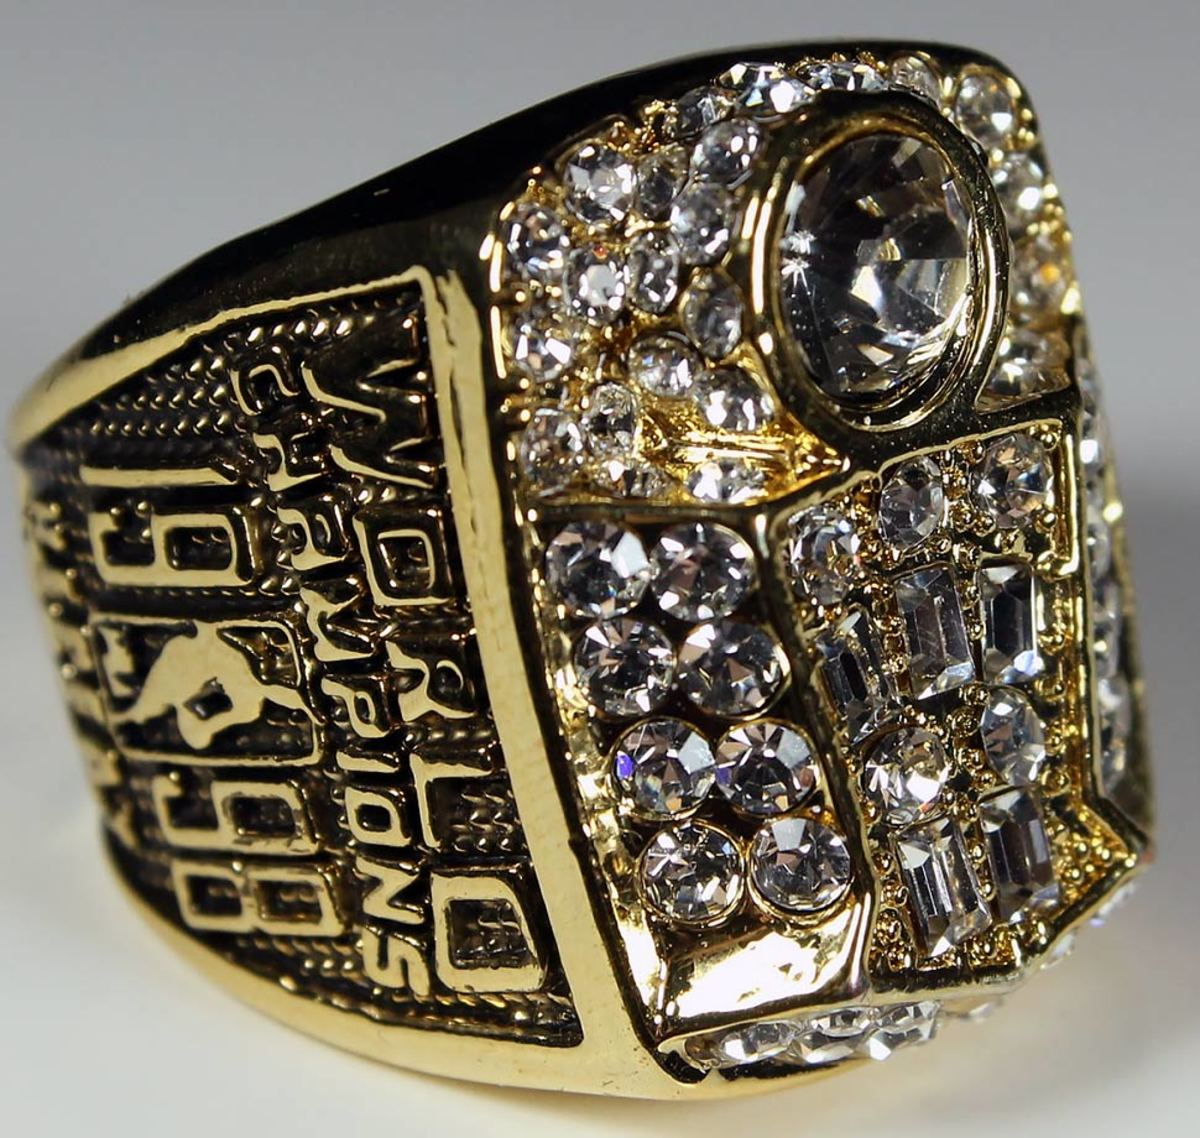 1998-Chicago-Bulls-NBA-Championship-ring.jpg